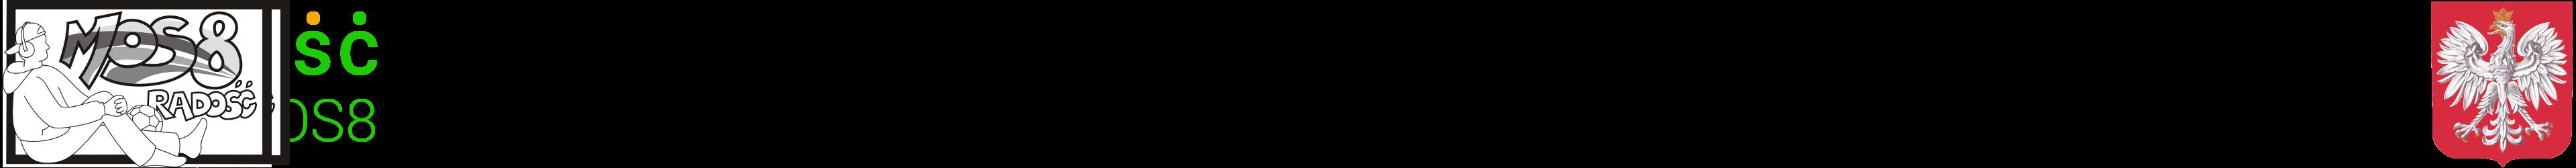 MOS 8